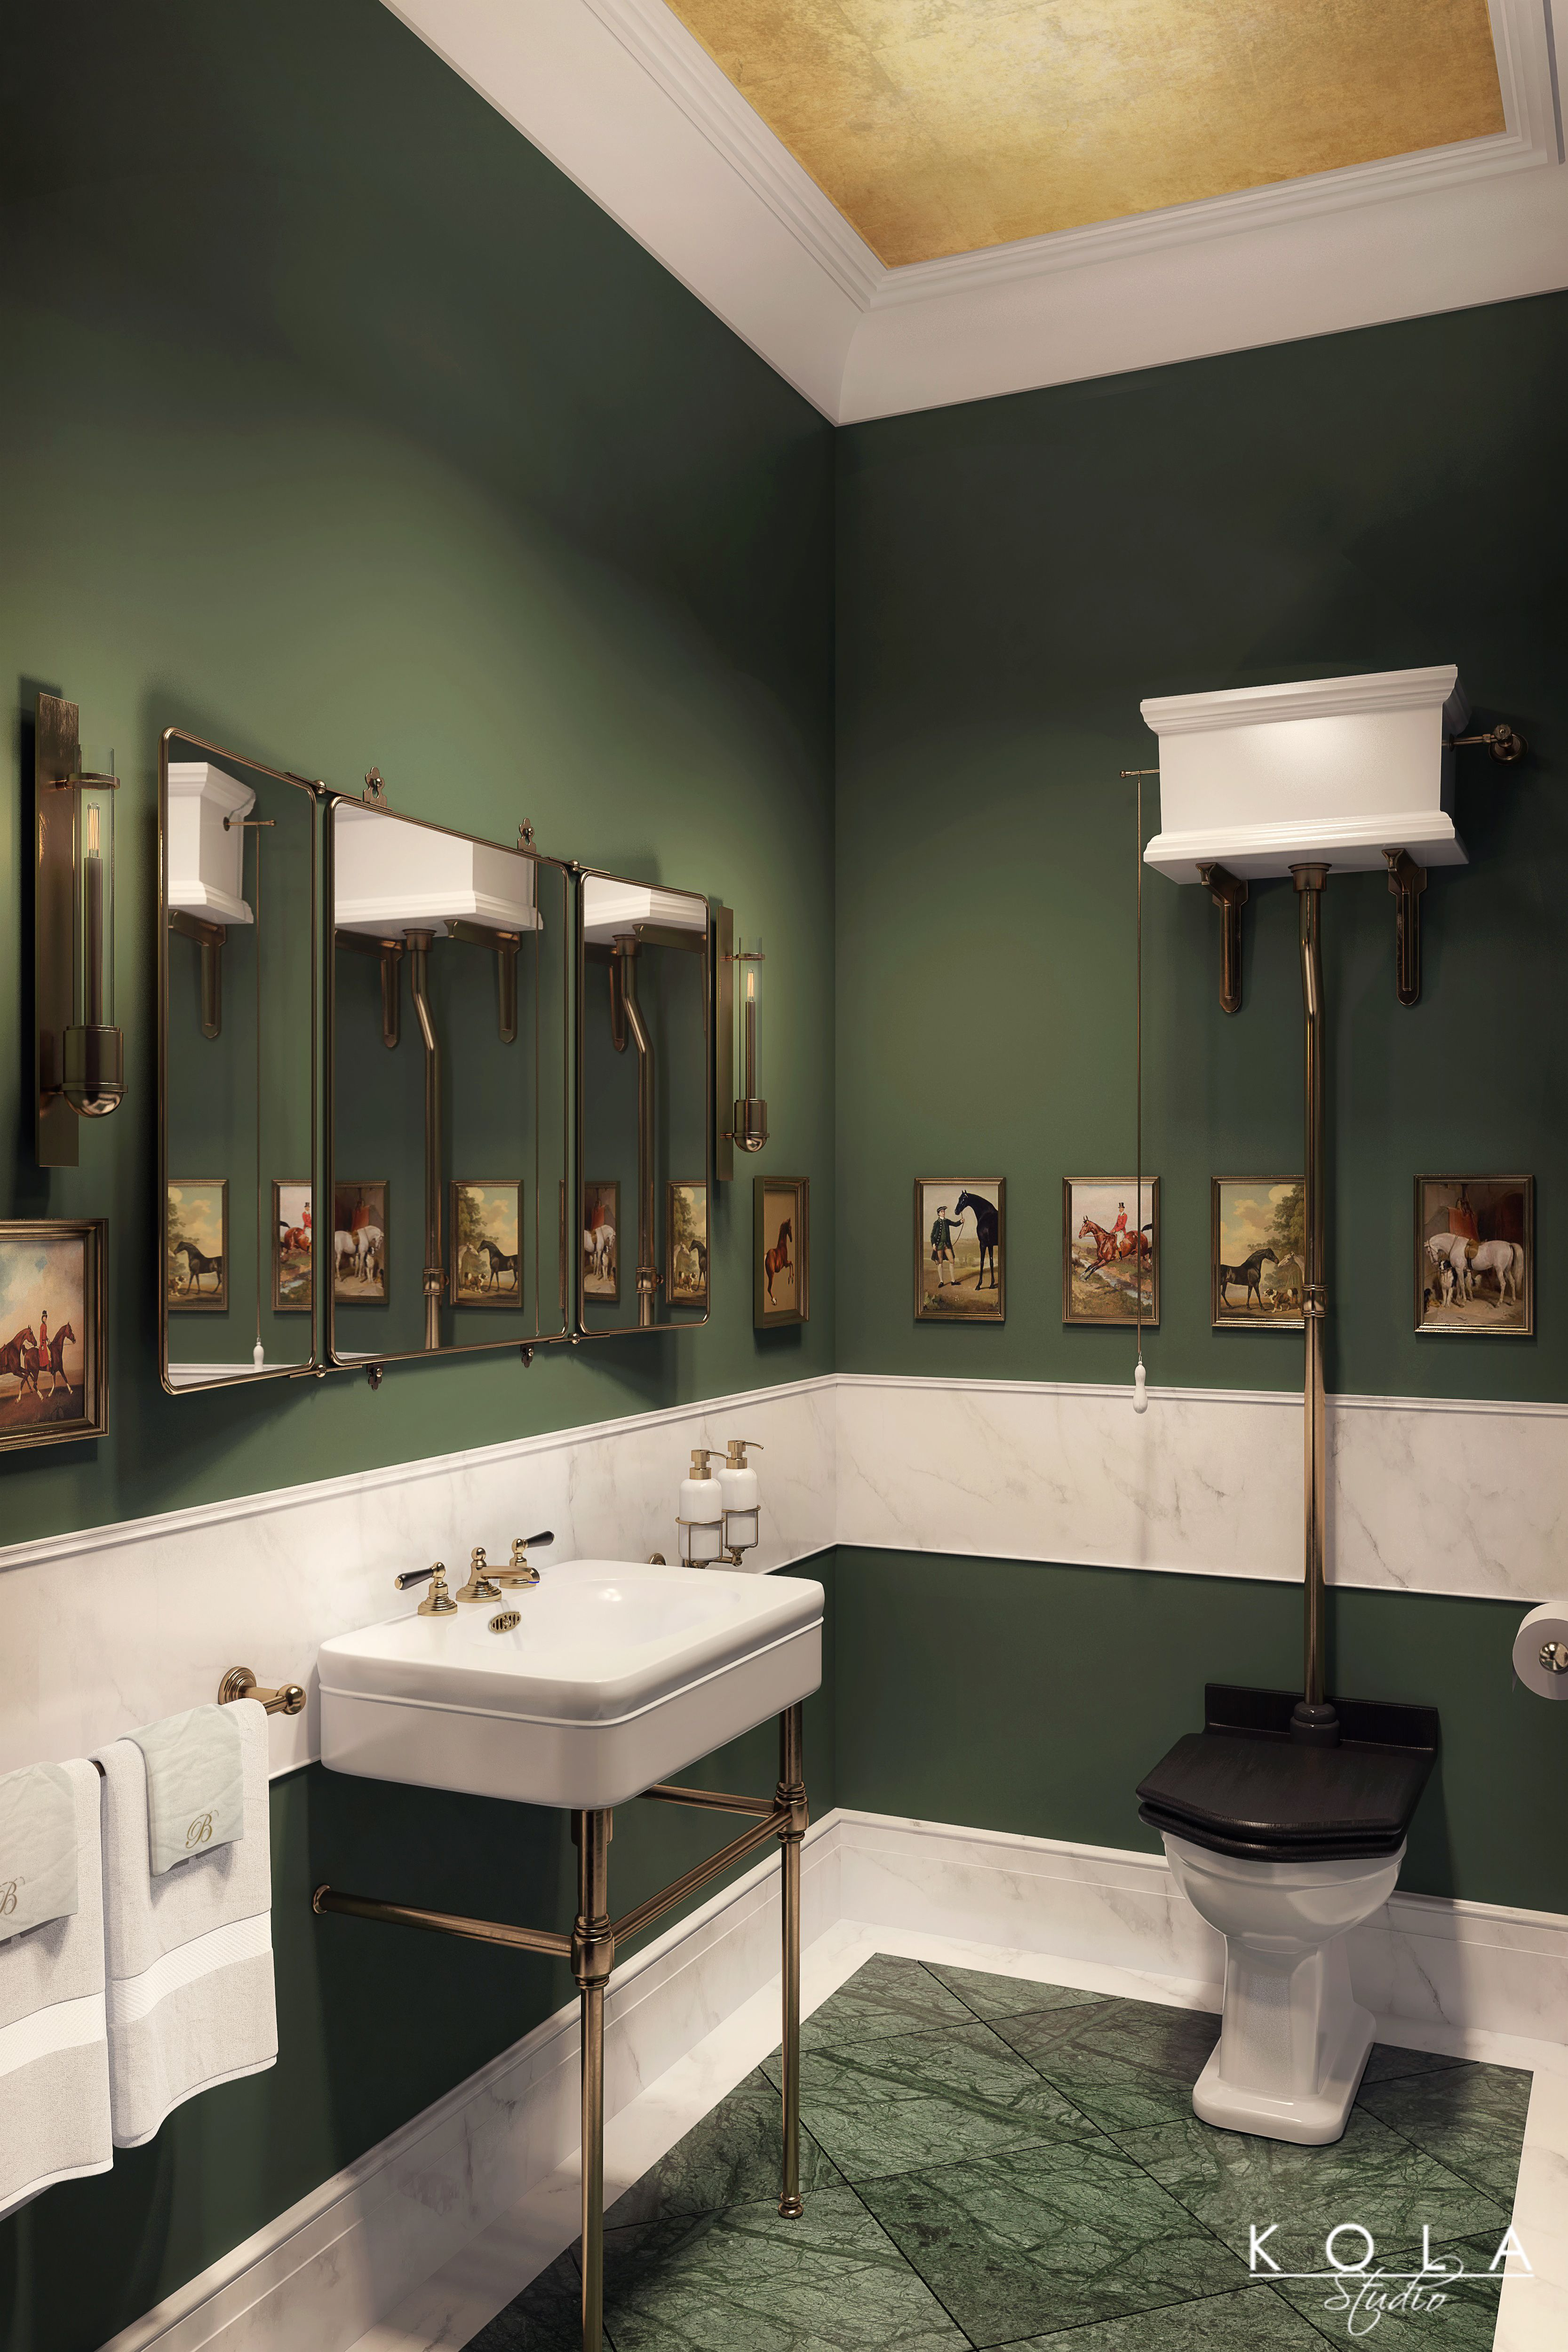 Interior Design Of Guest Room: Interior Visualization Of Elegant Classical Guest Bathroom